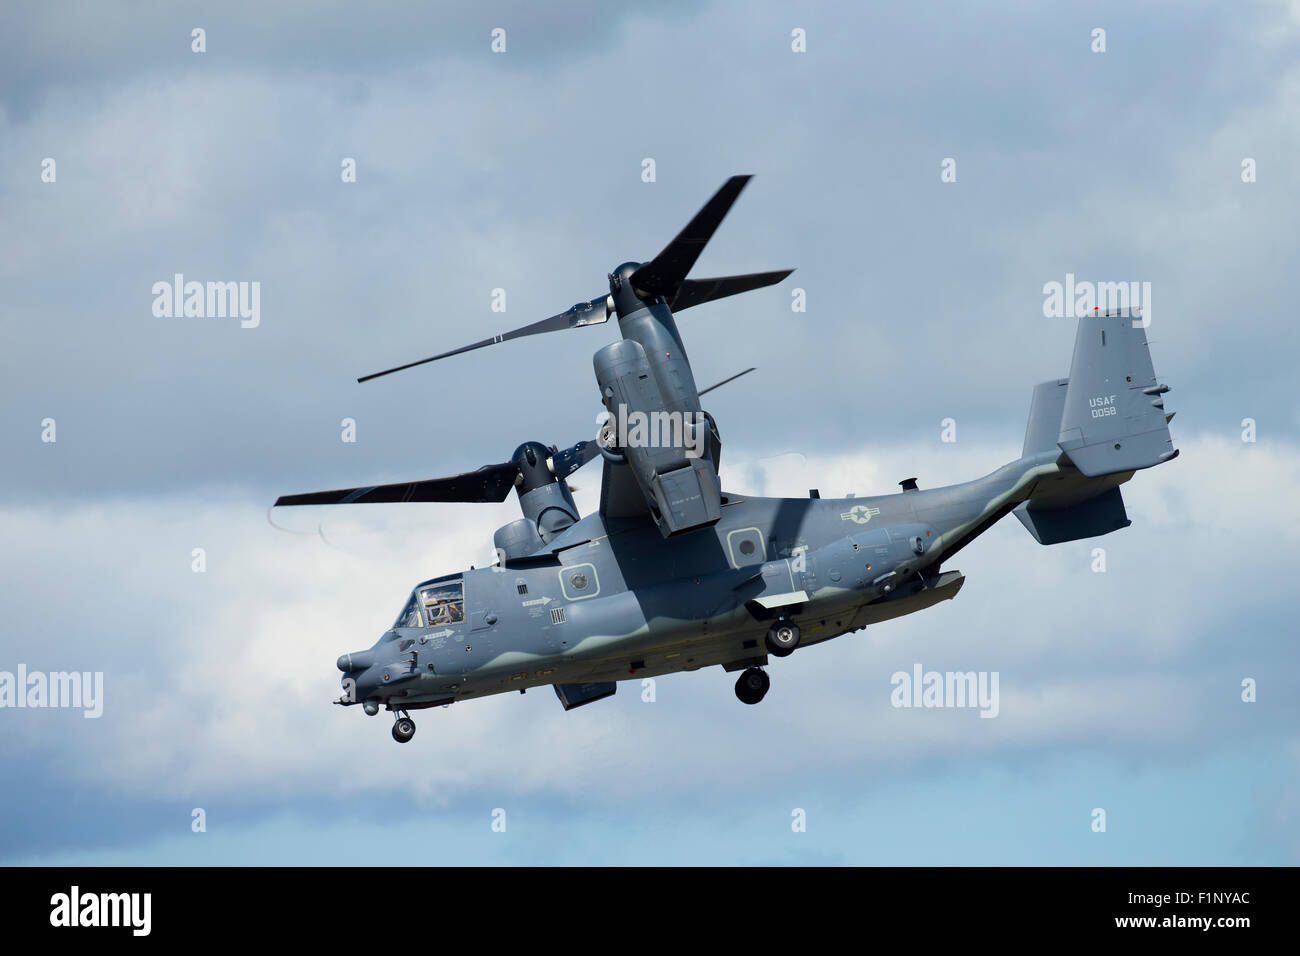 Cv Stockfotos & Cv Bilder - Alamy